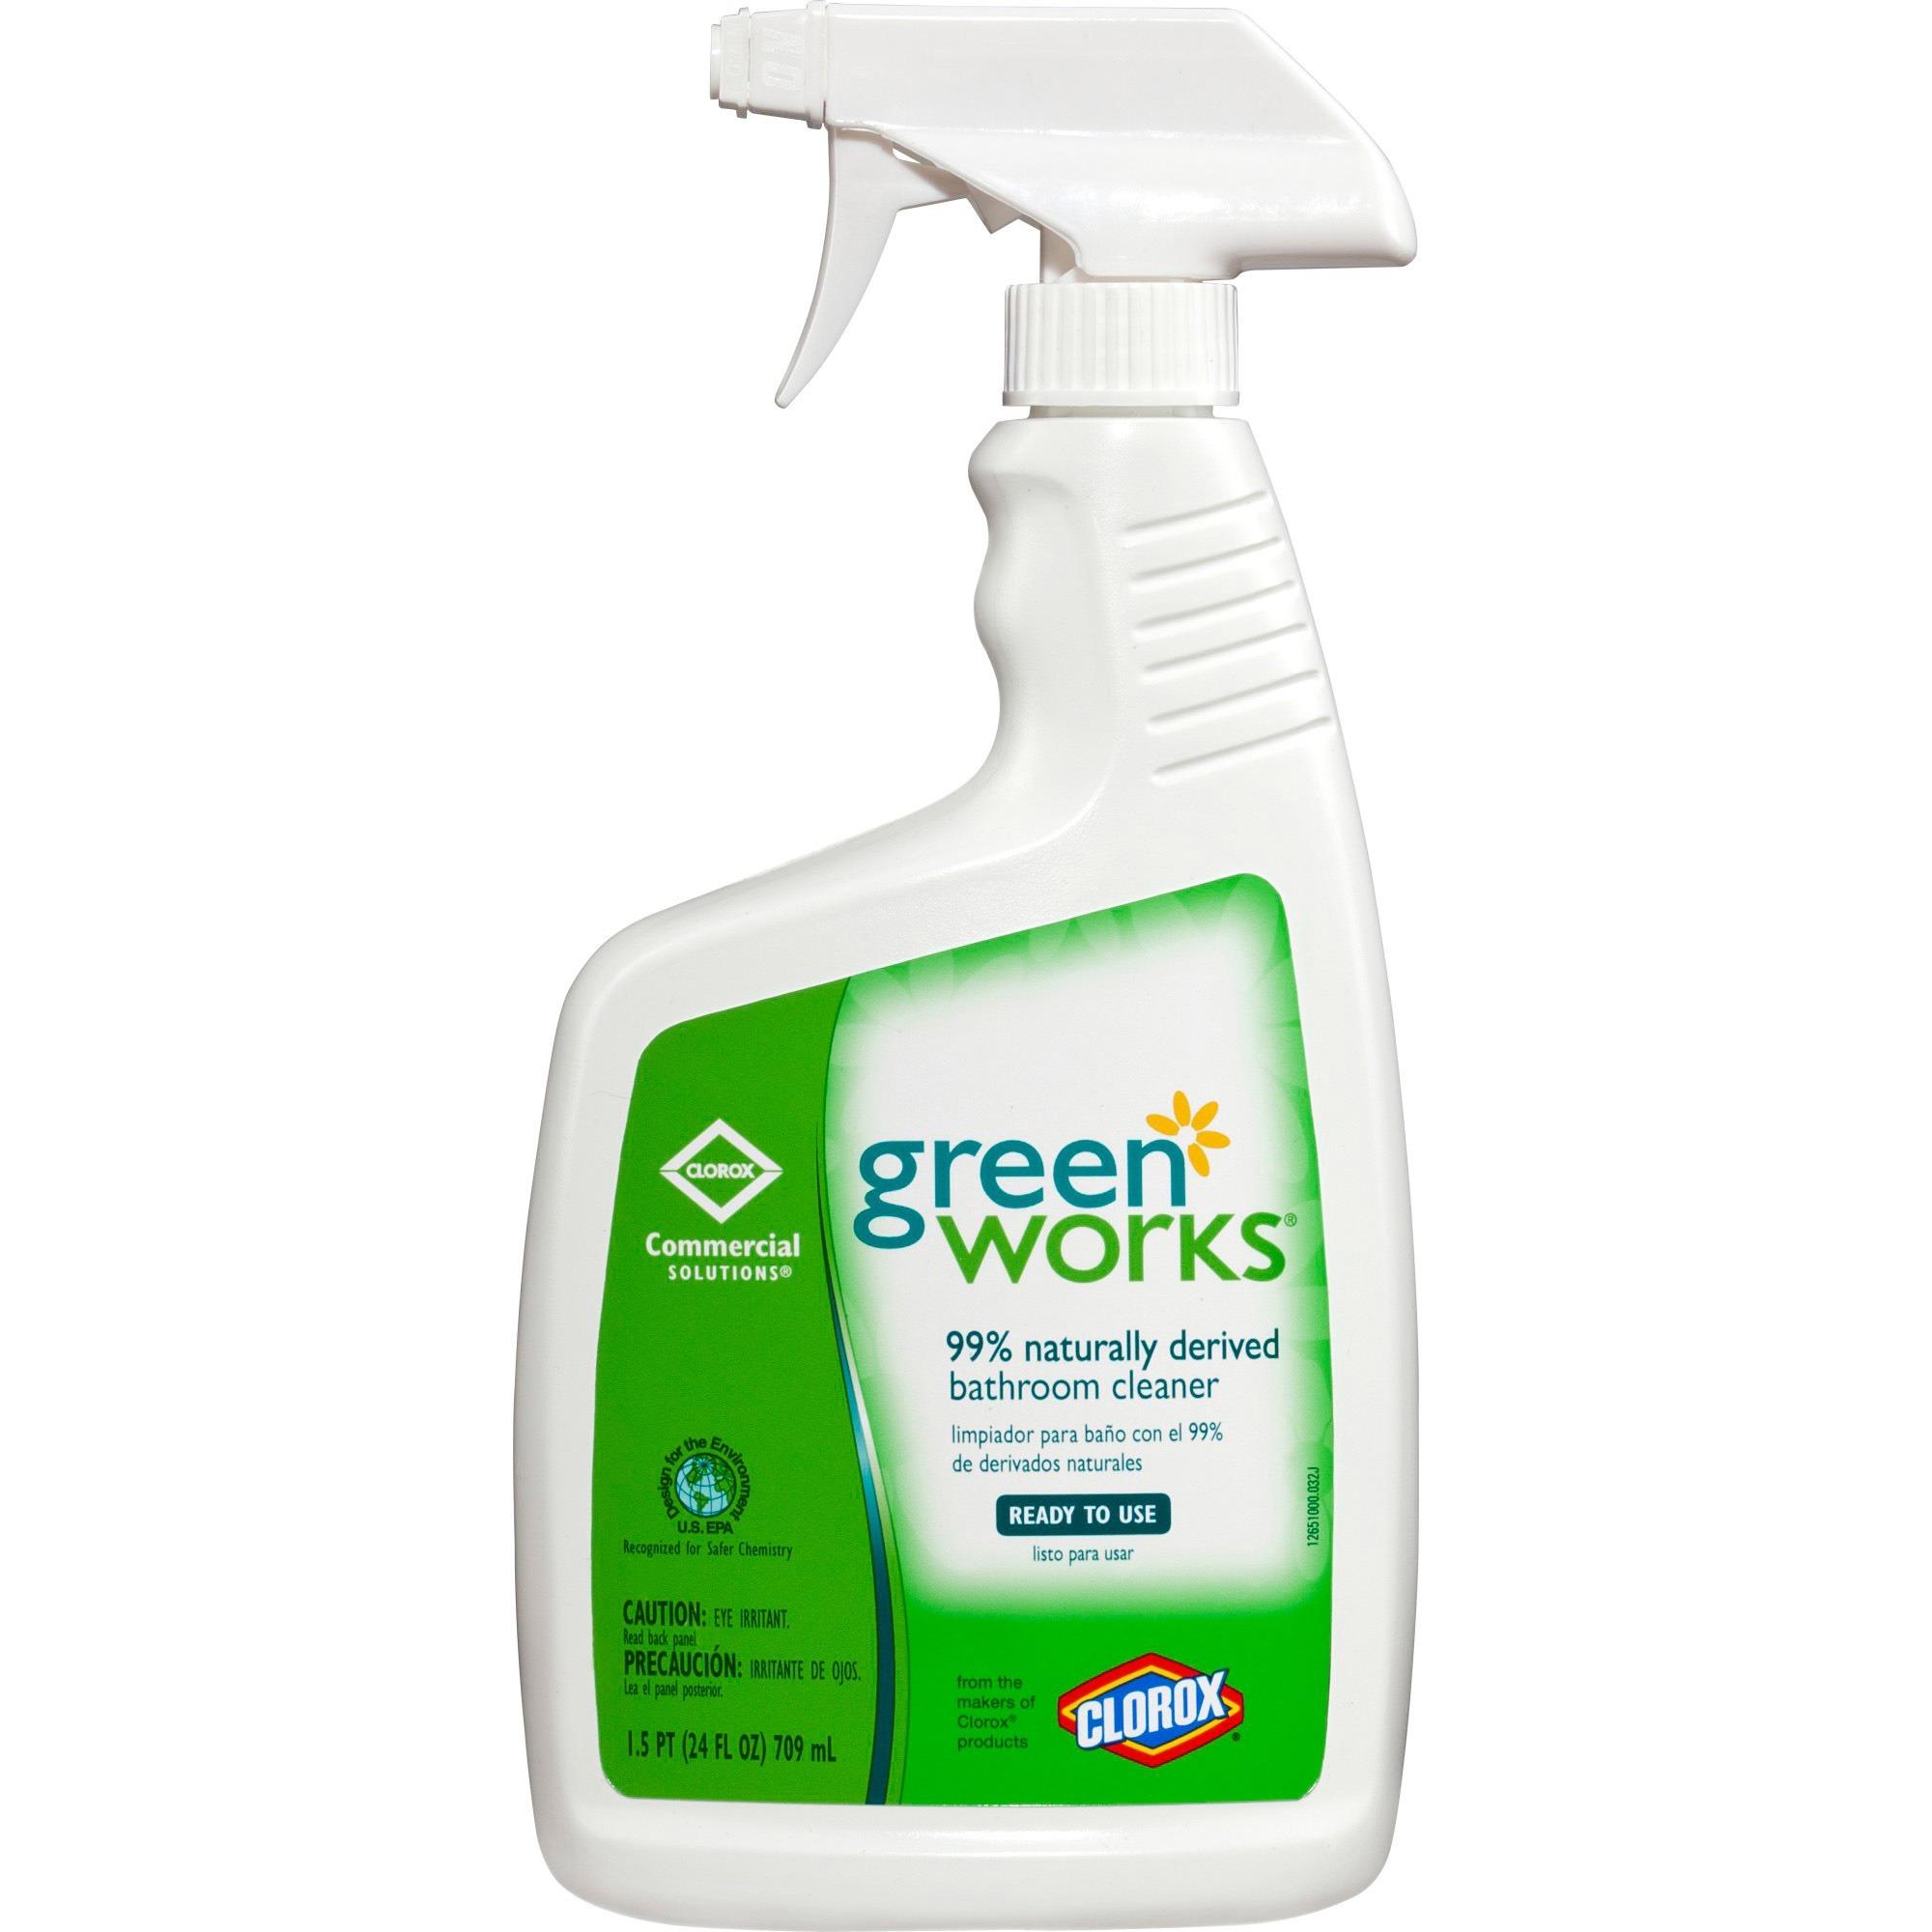 green works natural bathroom cleaner foam spray 70681 ml 1 each - Bathroom Cleaning Supplies